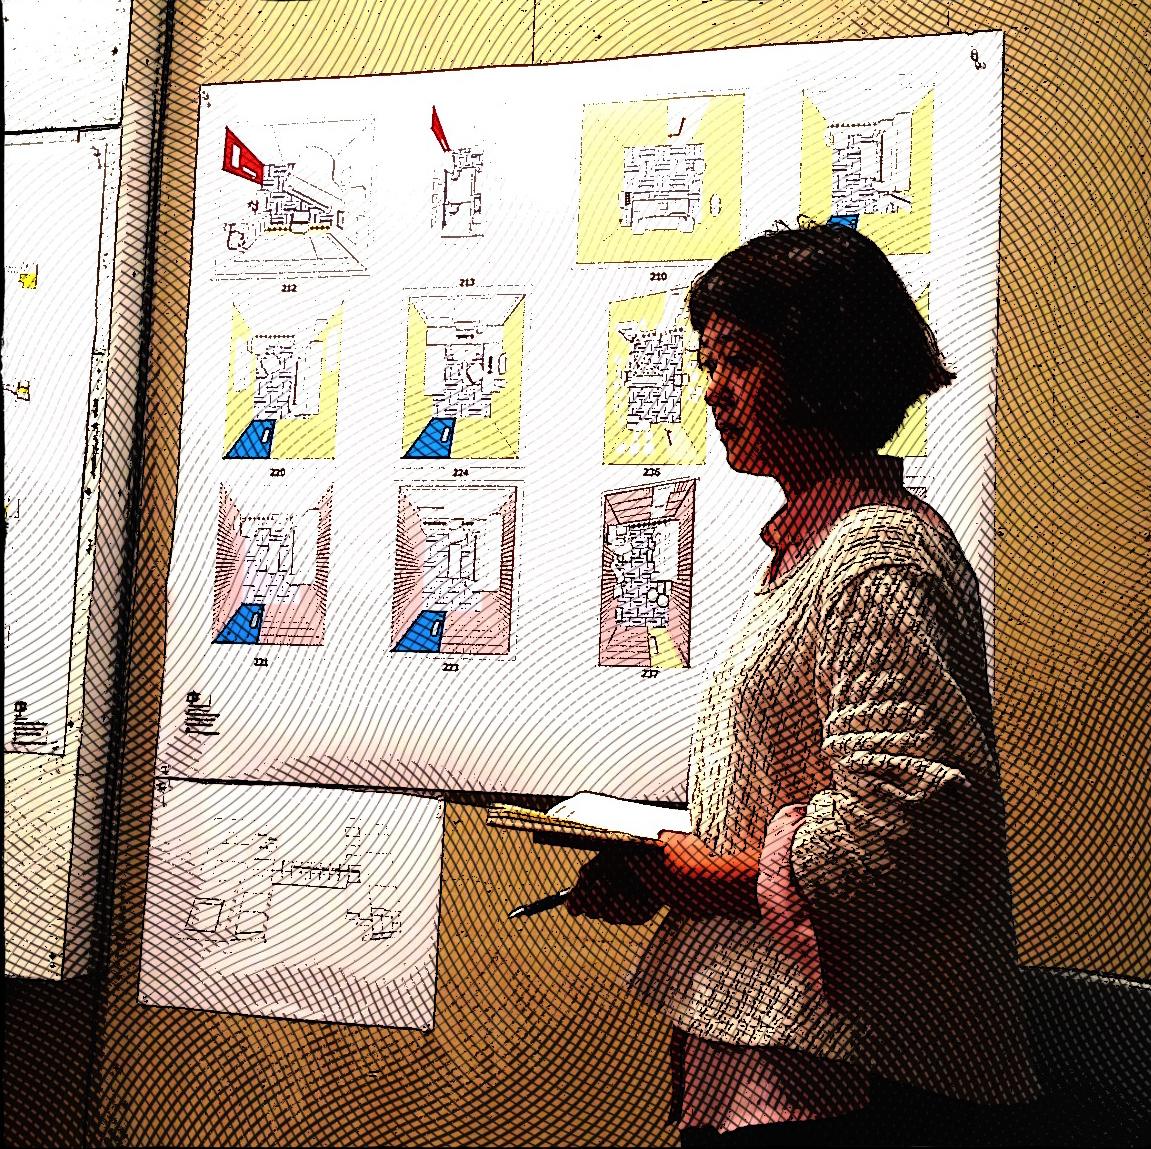 Shu Zhao Presenting her drawings